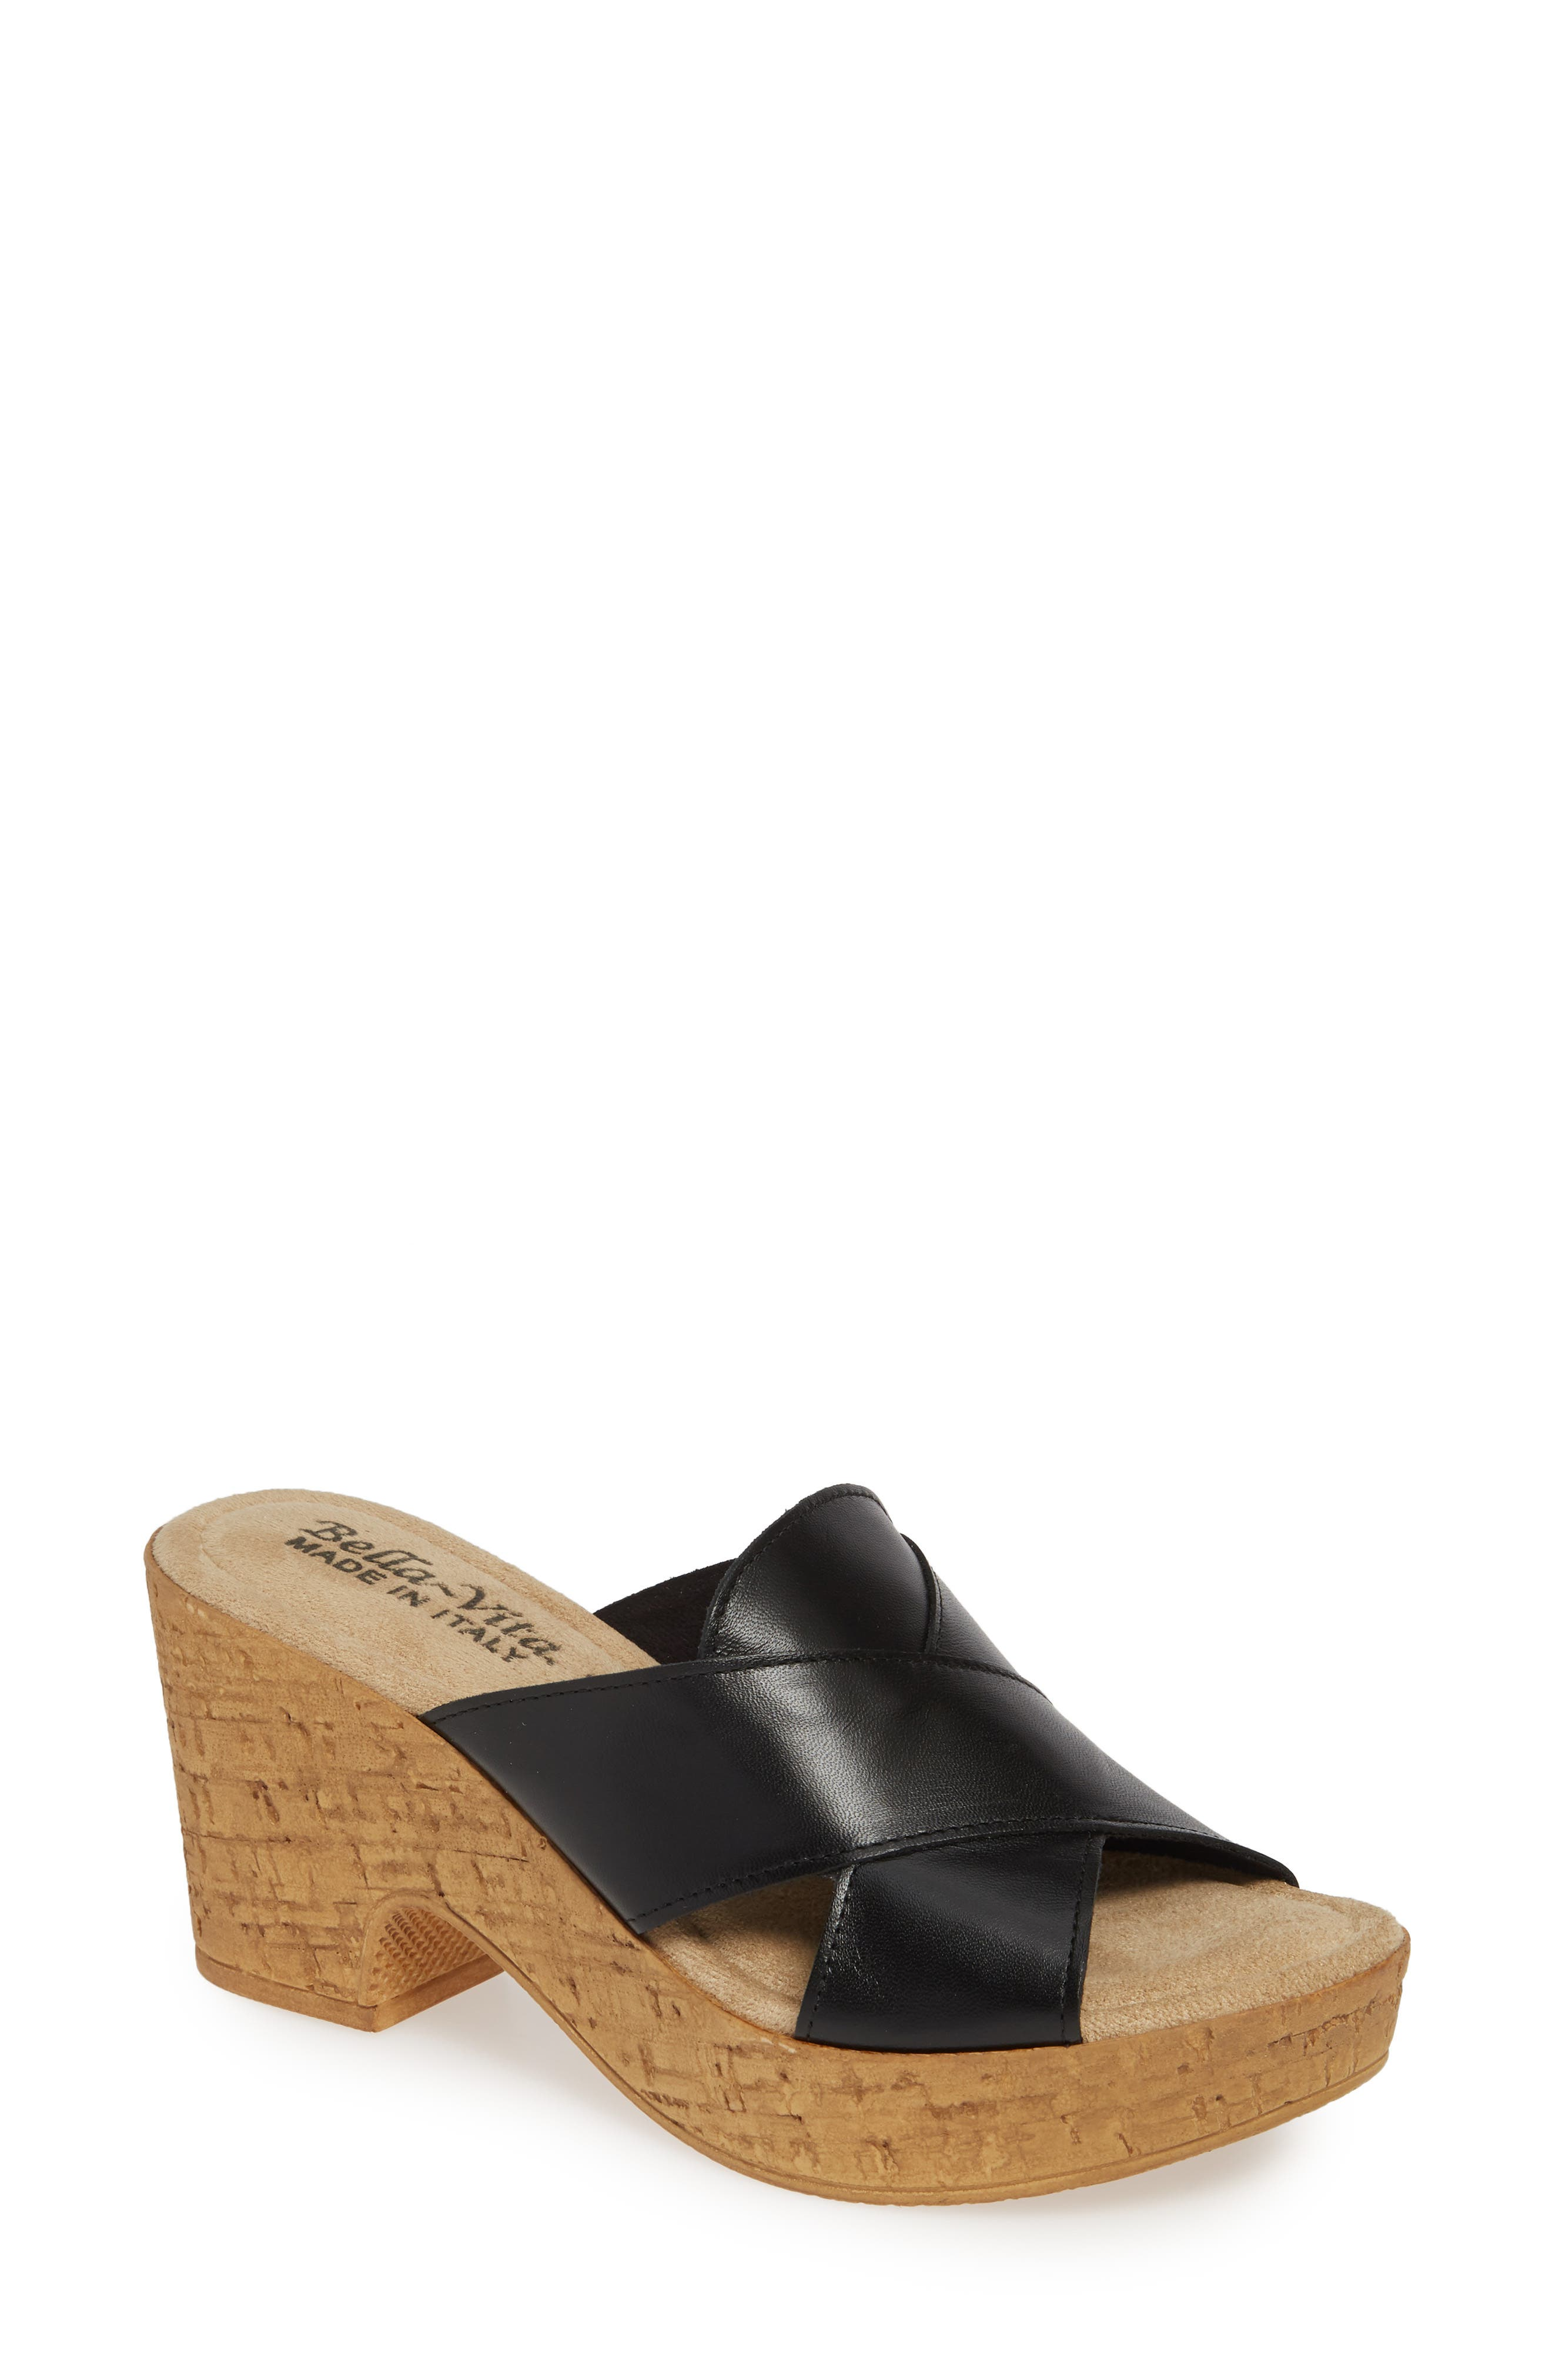 Bella Vita Platform Sandal, Black